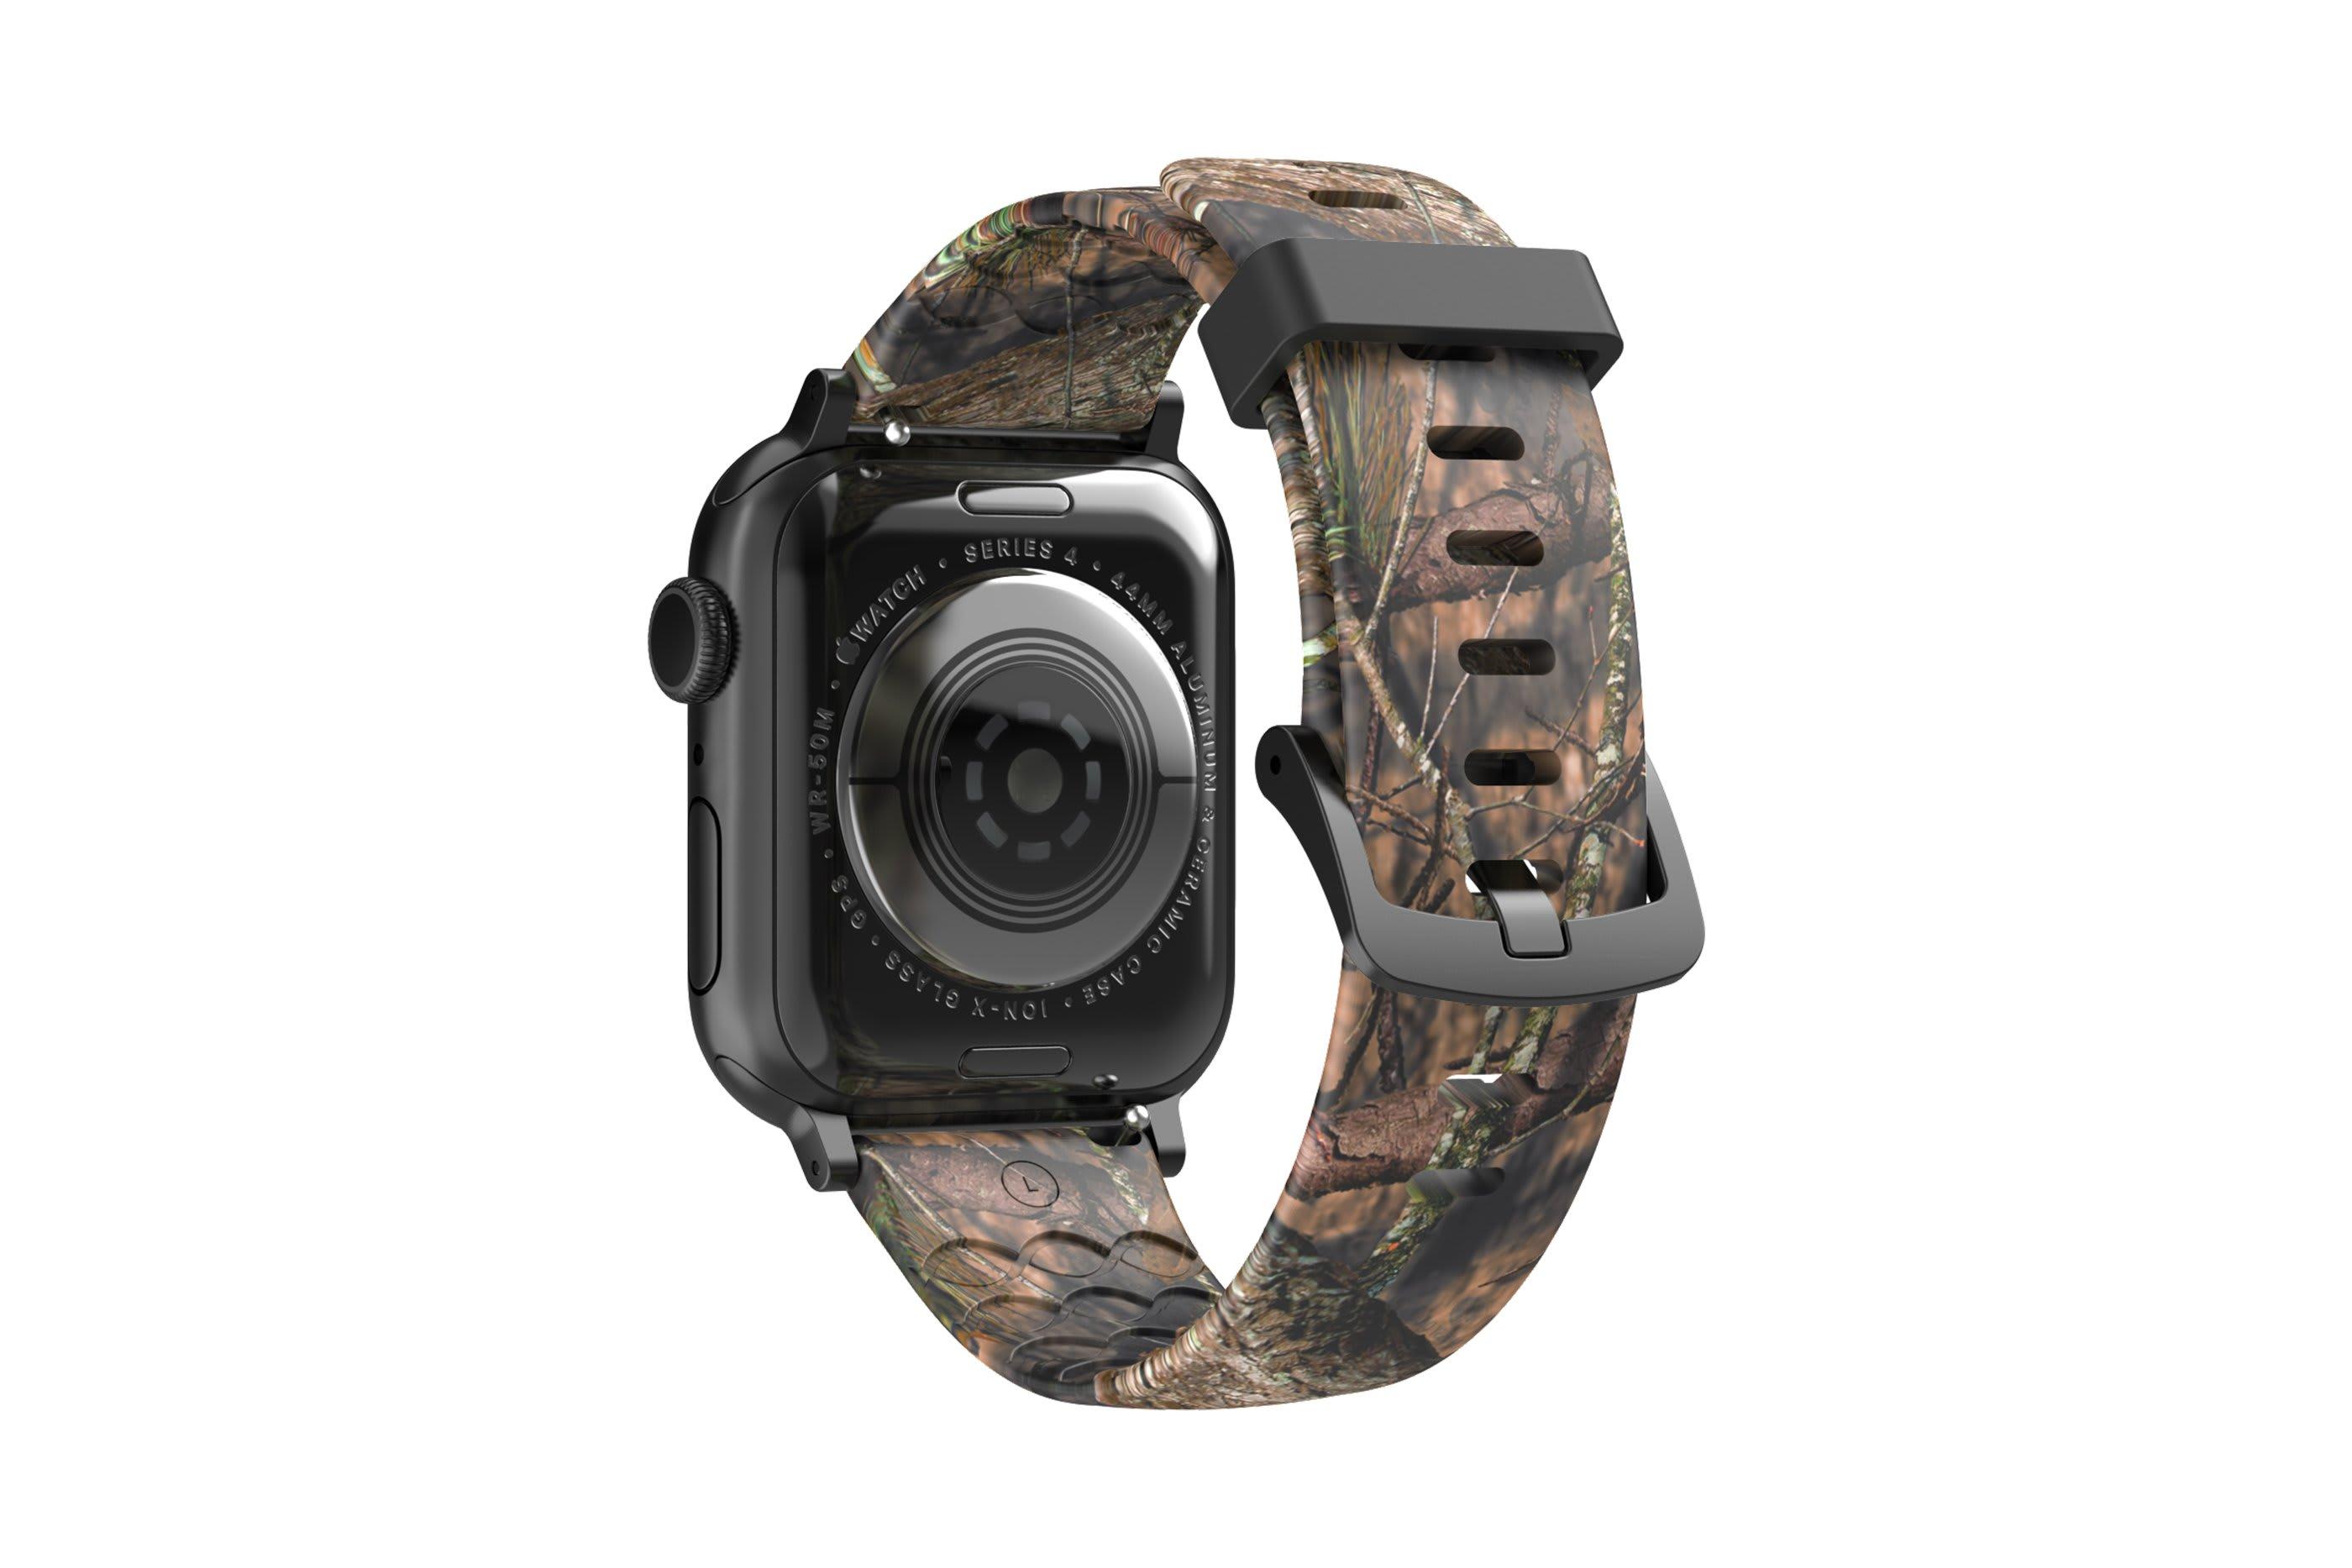 Mossy Oak Breakup Apple Watch Band with gray hardware viewed from rear